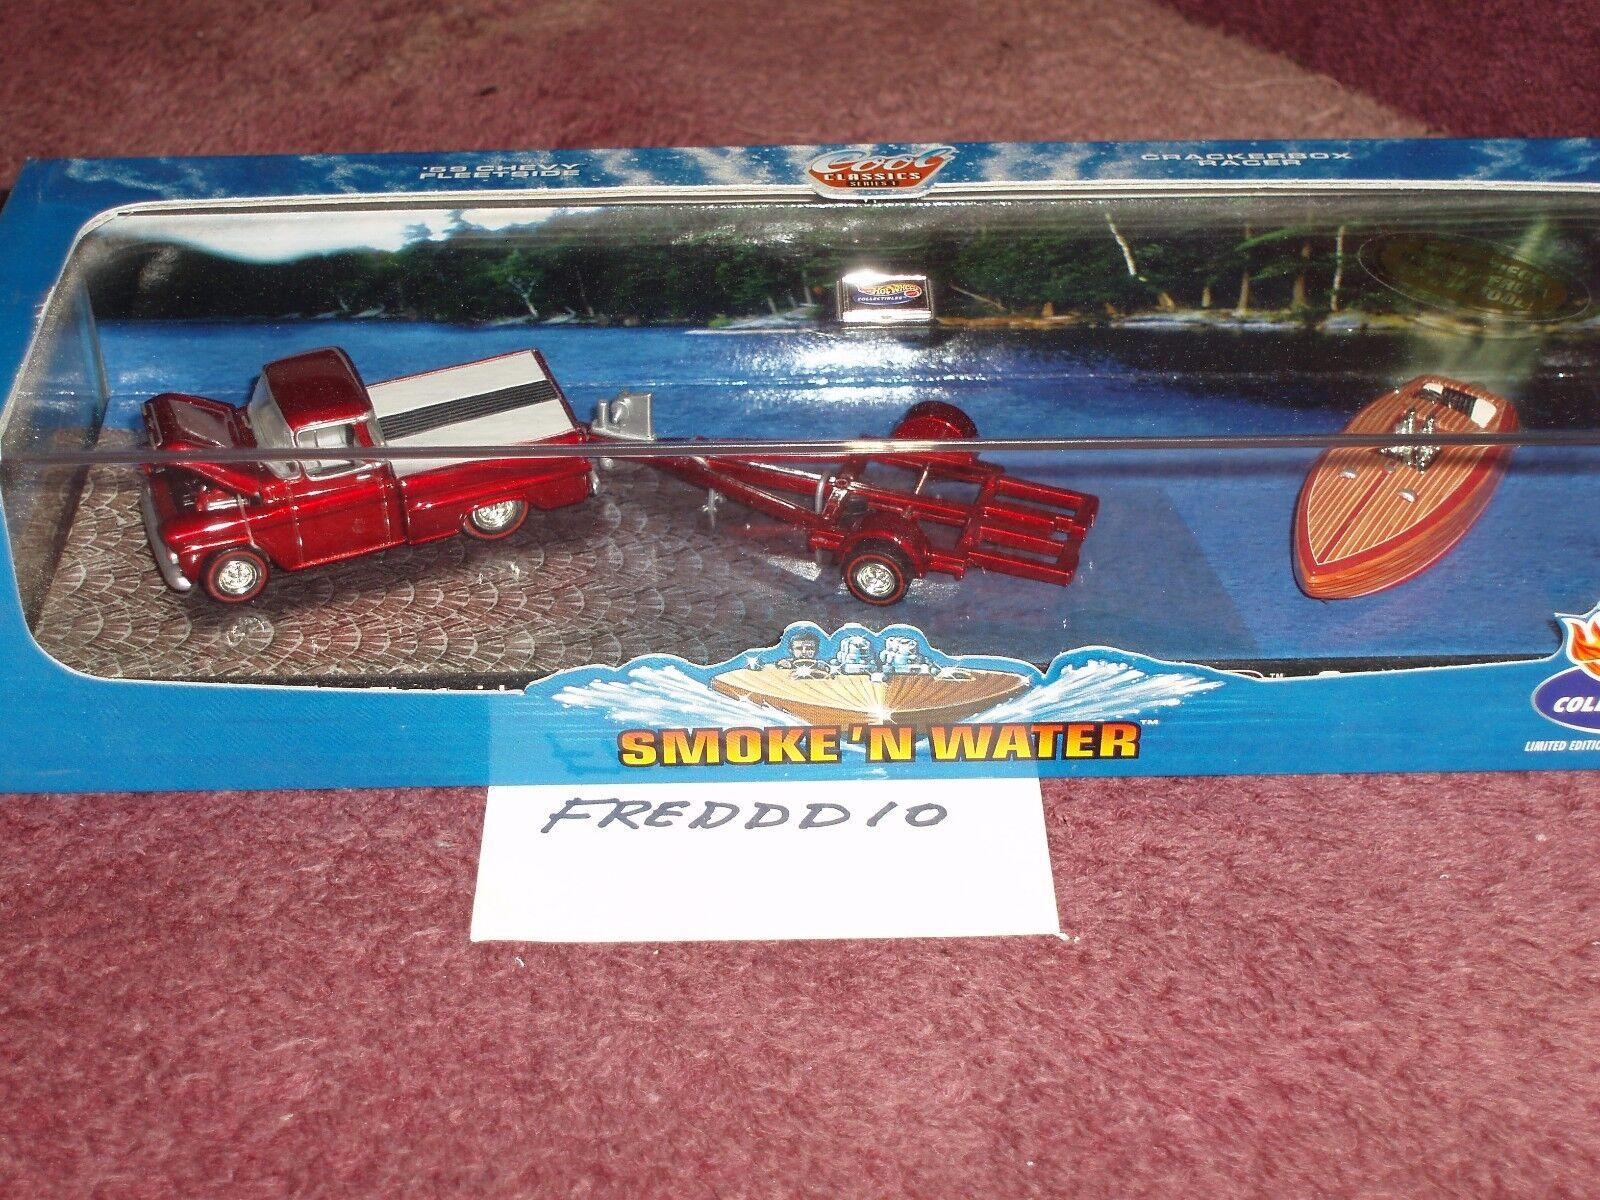 100% Hotwheels humo y agua 1959 Chevy PU, PU, PU, Remolque & crackerbox Racer Barco 05e4e2